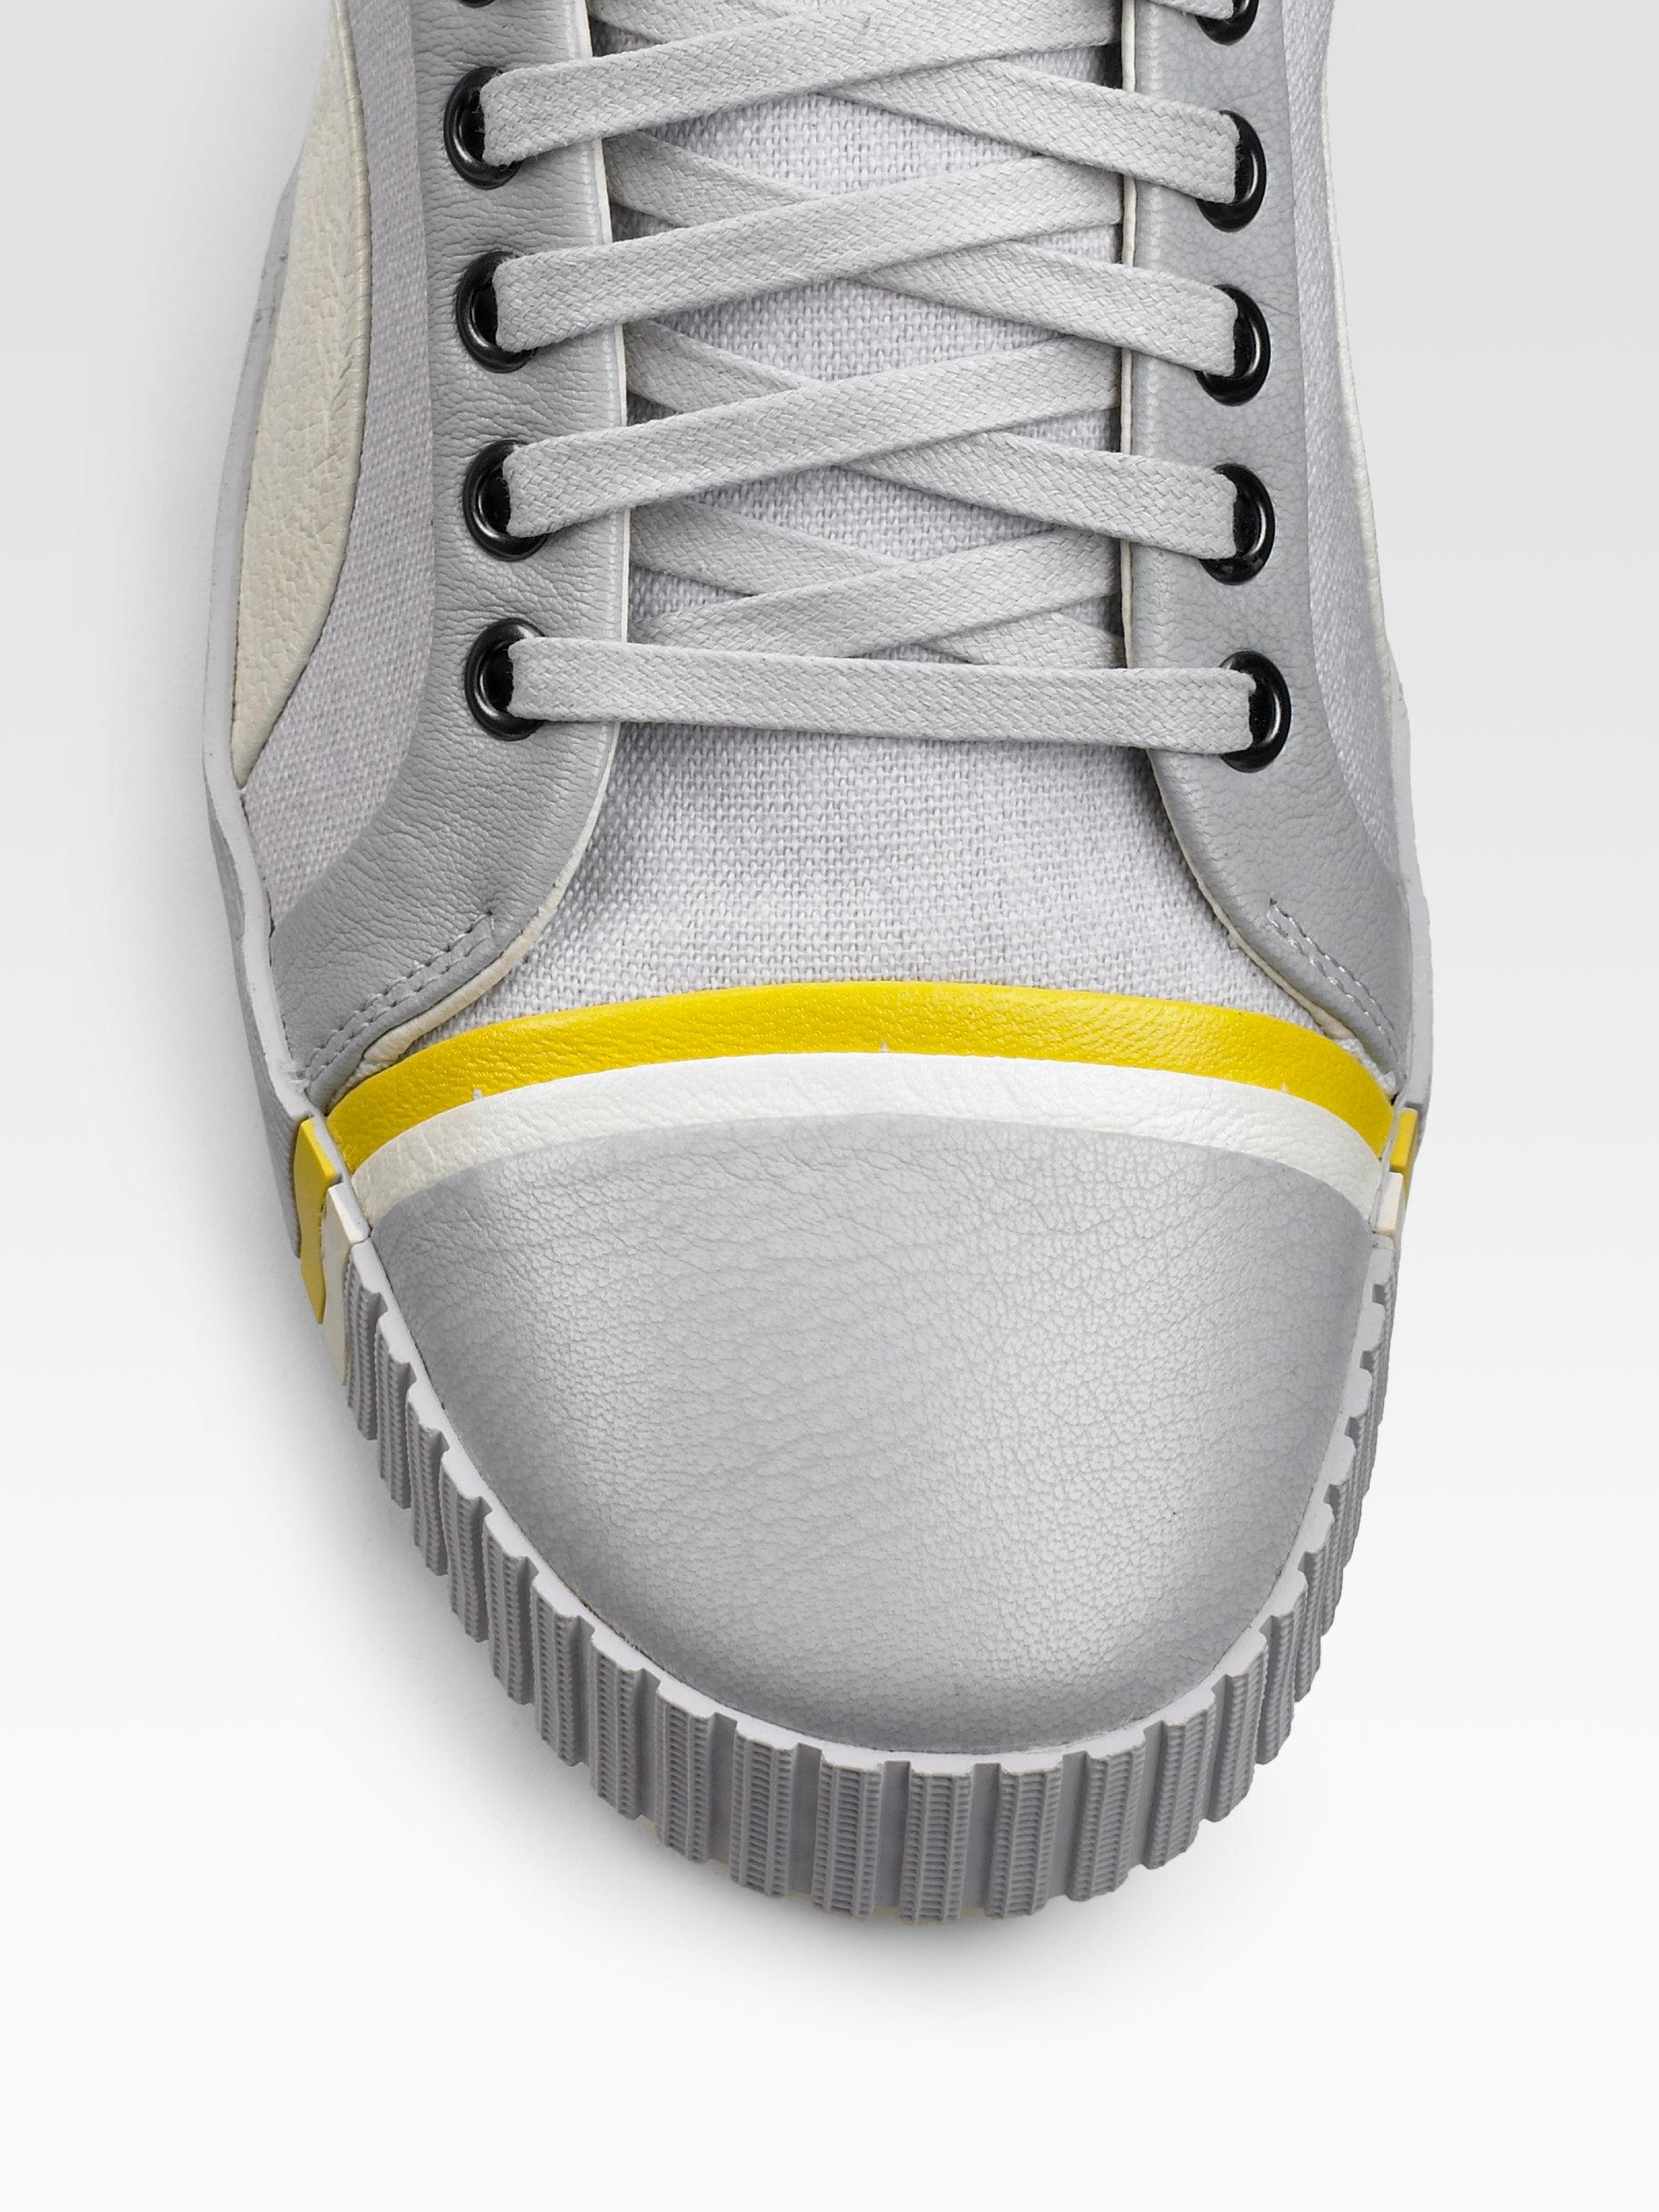 online store 43c03 e8fce Alexander McQueen X Puma Scarred Street Midtop Sneakers in Gray for ...